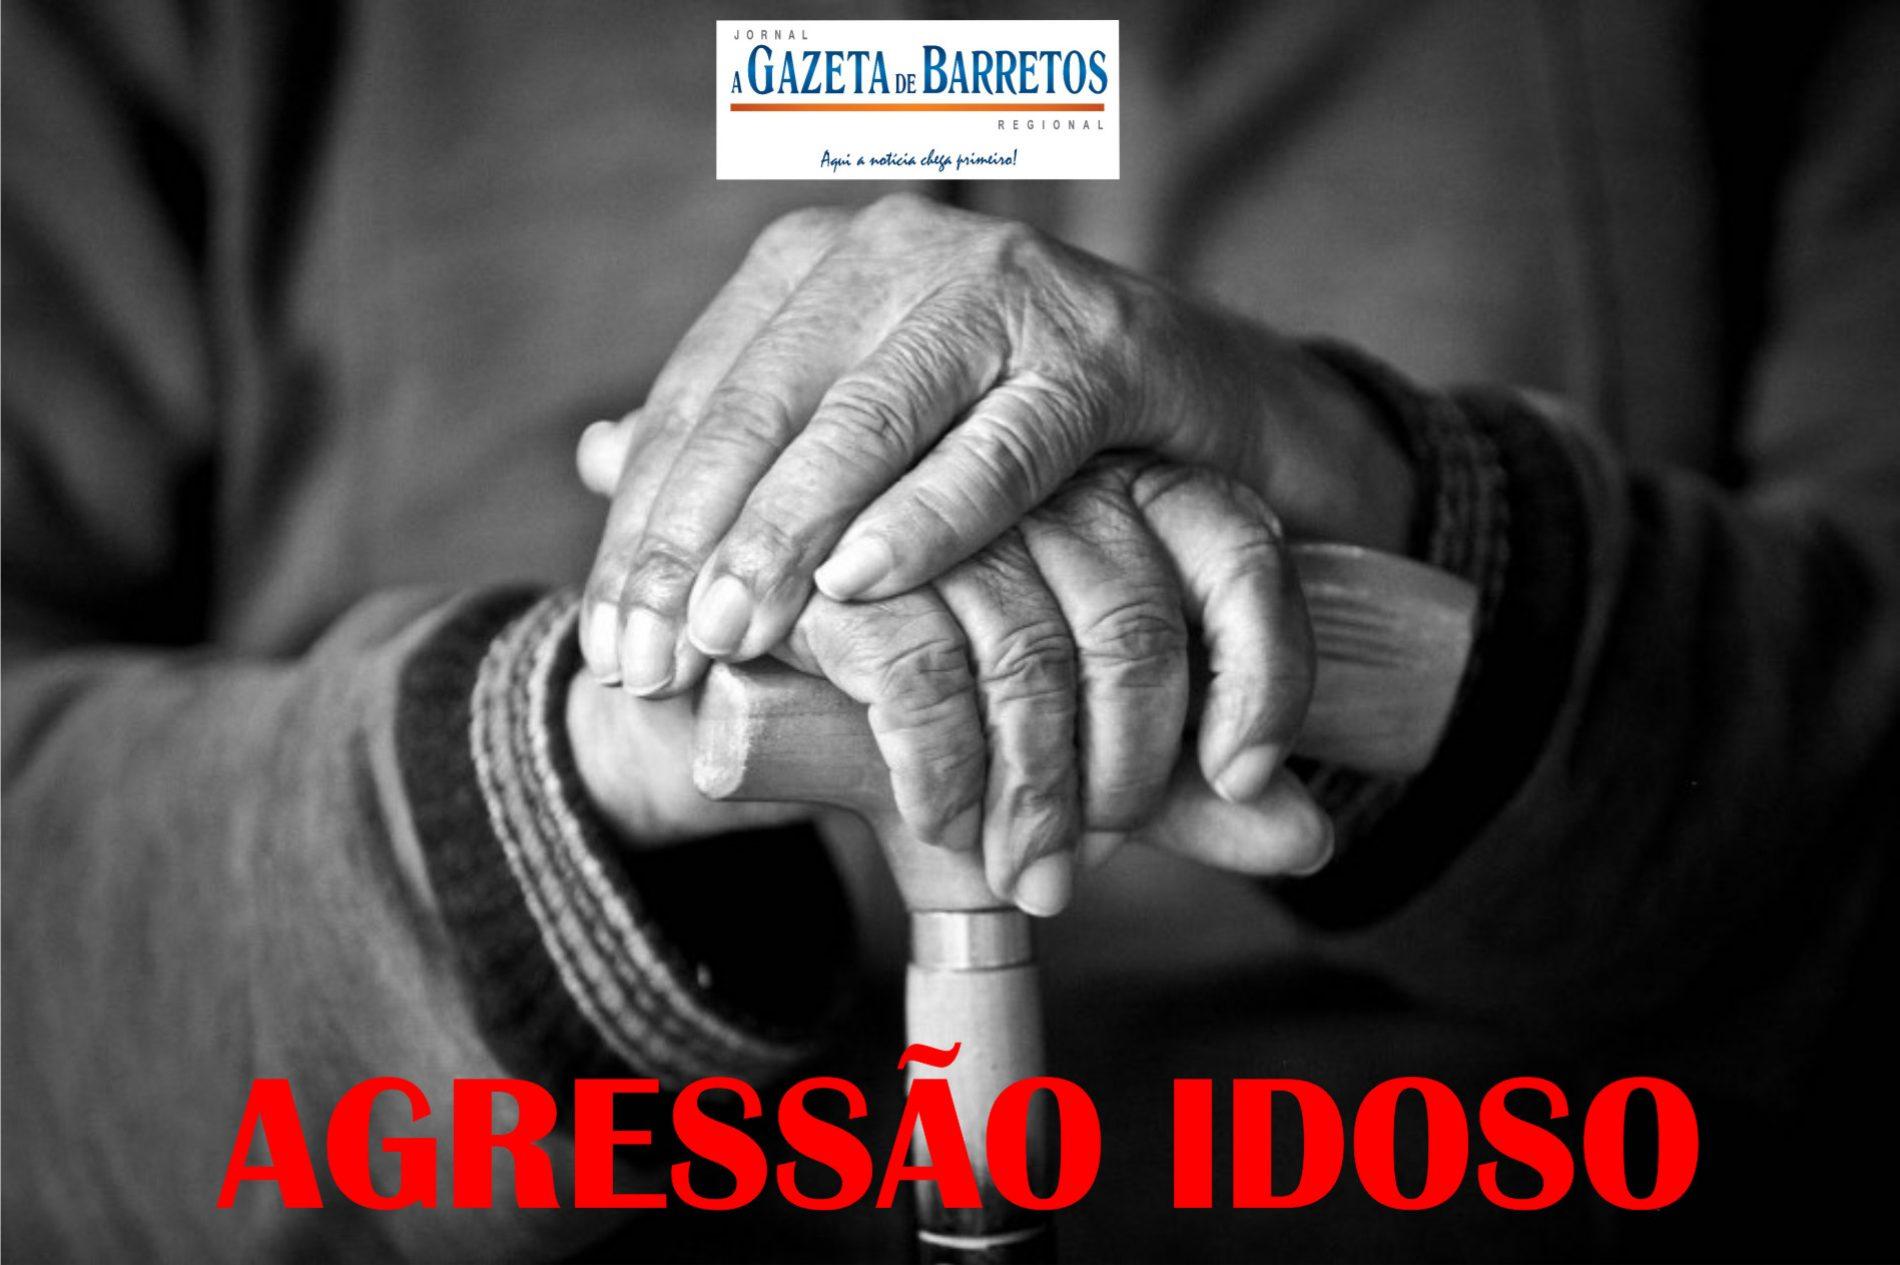 Idoso é agredido pelo filho no bairro Fortaleza